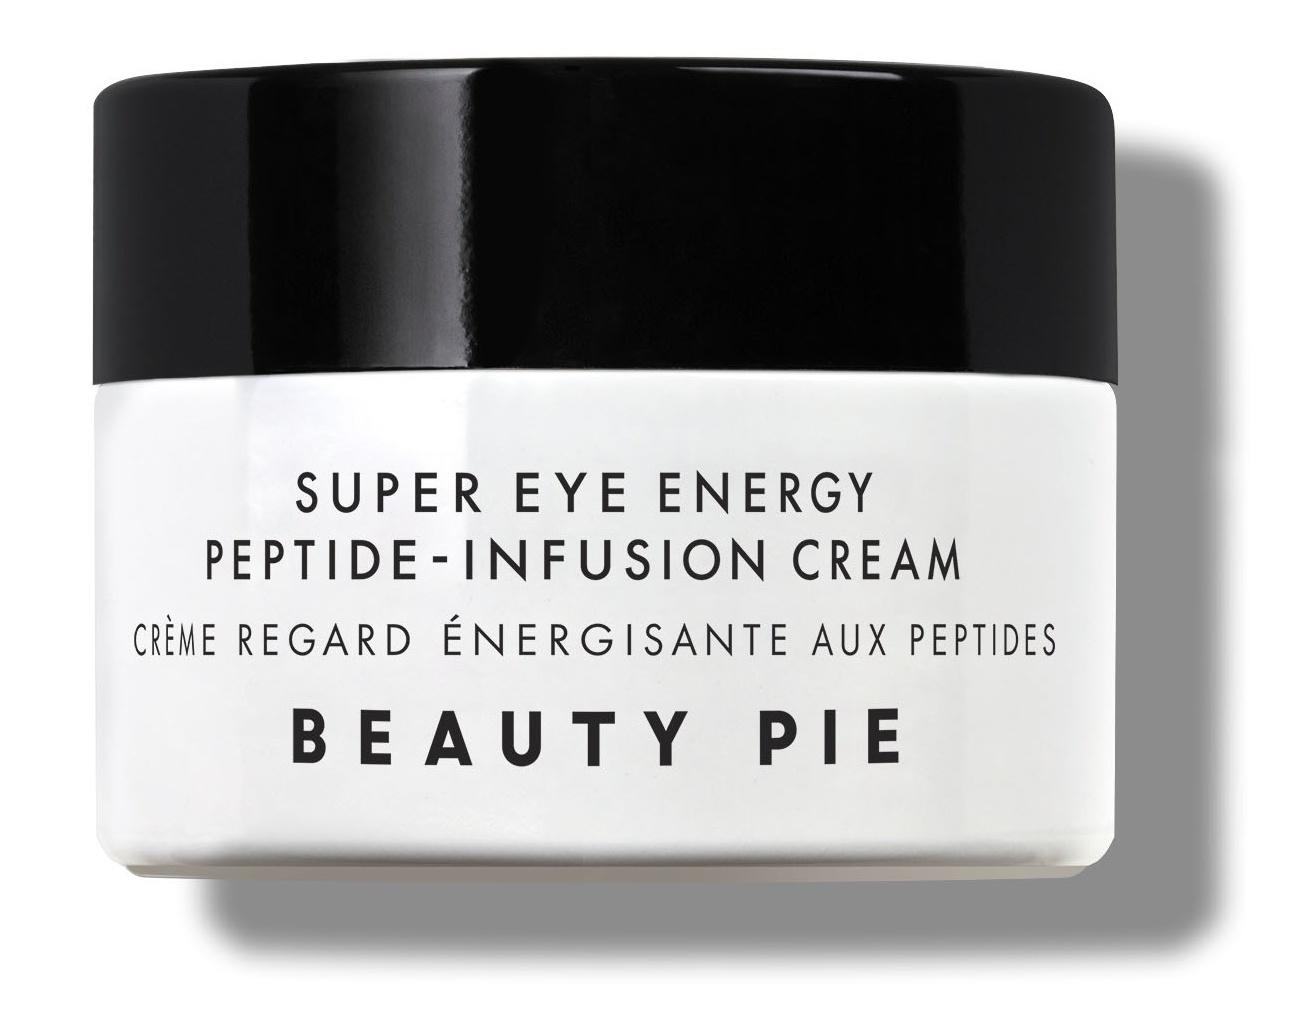 Beauty Pie Super Eye Energy Peptide - Infusion Cream